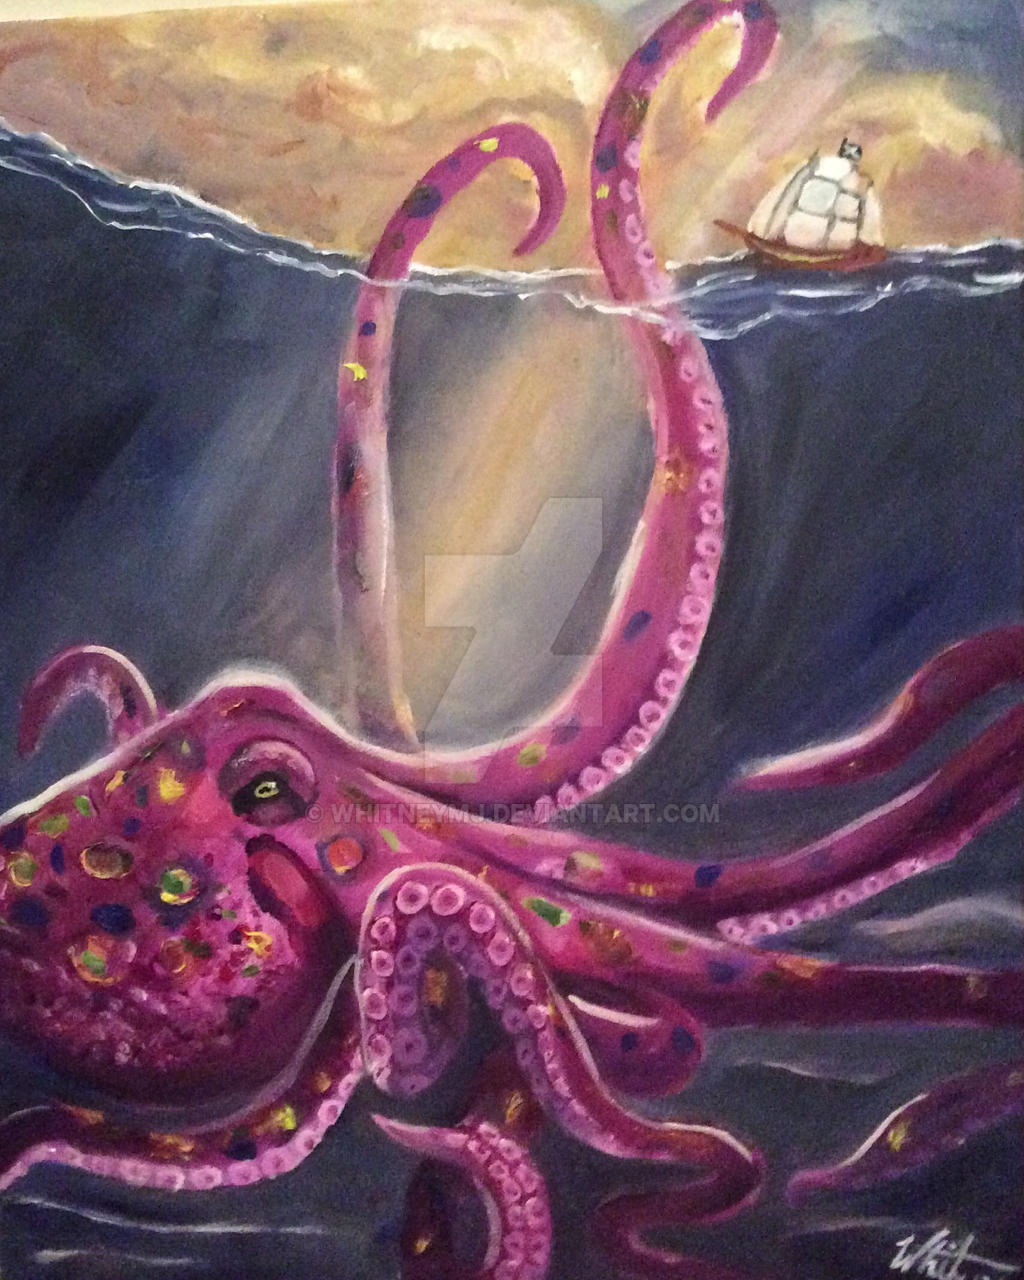 Kraken by WhitneyMJ on DeviantArt